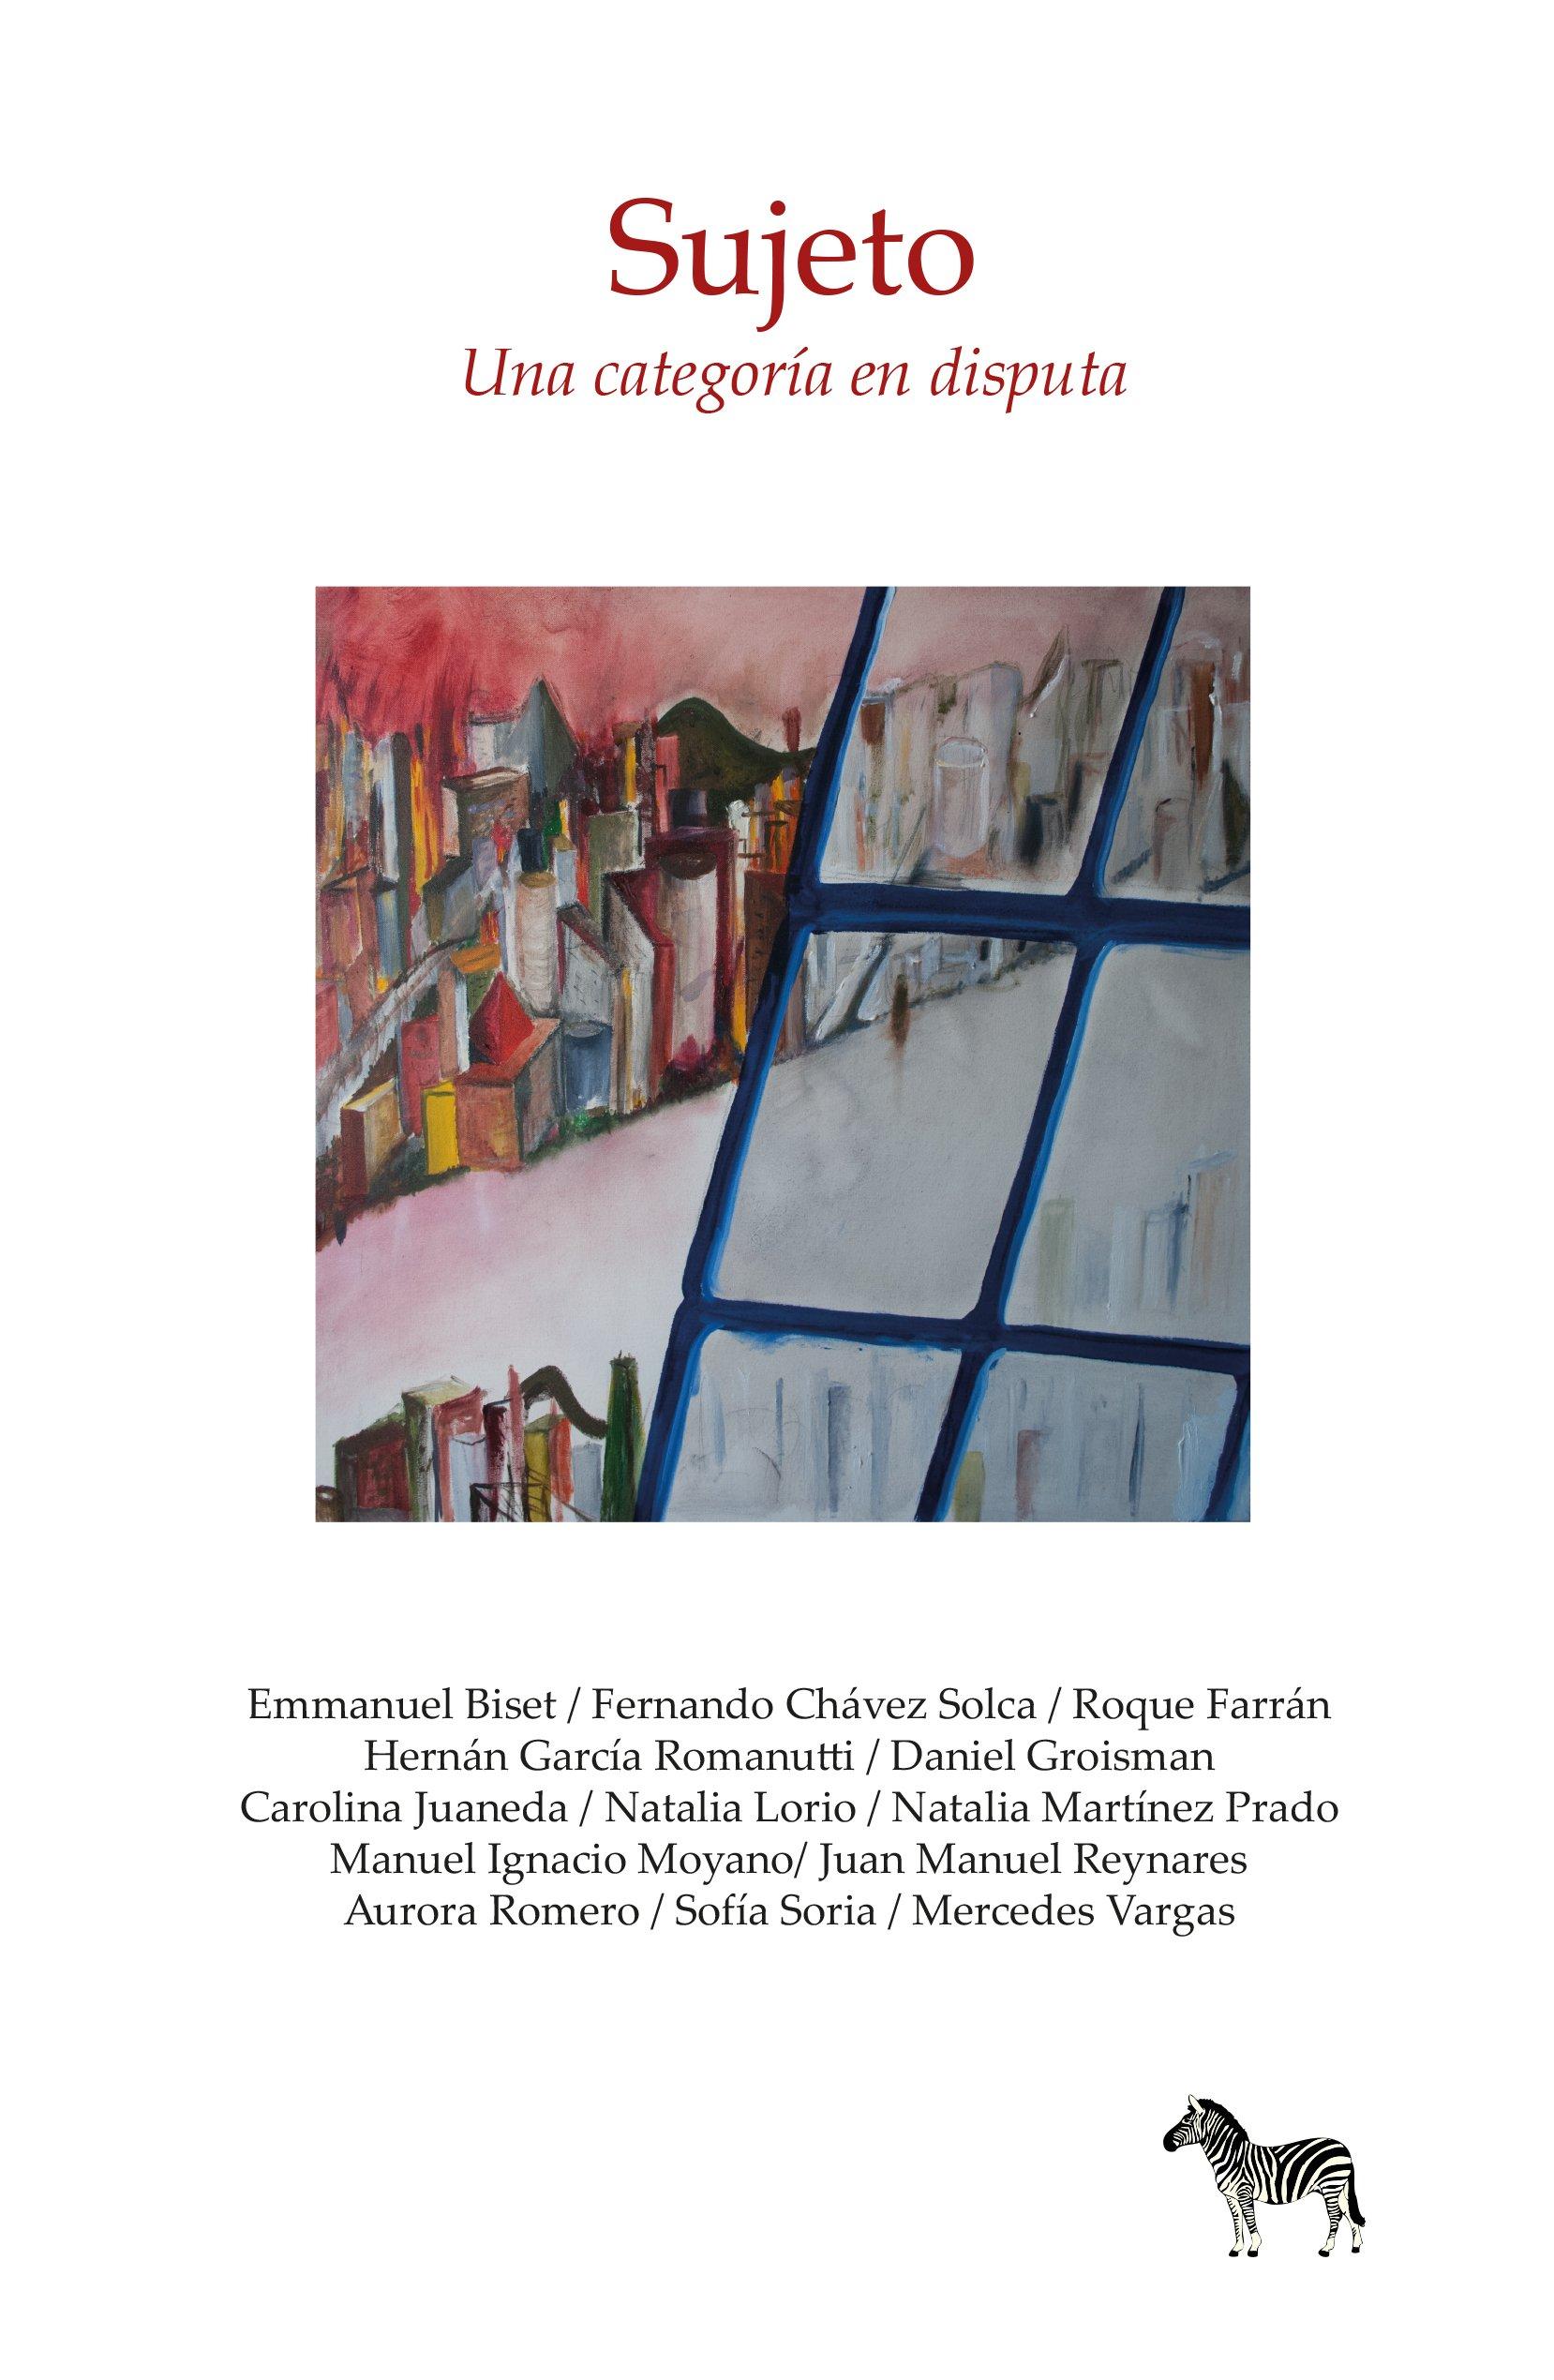 SUJETO, UNA CATEGORIA EN DISPUTA: Fernando Chávez Solca, Roque Farrán, Hernán García Romanutti / Daniel Groisman Carolina Juaneda, Natalia Lorio, ...